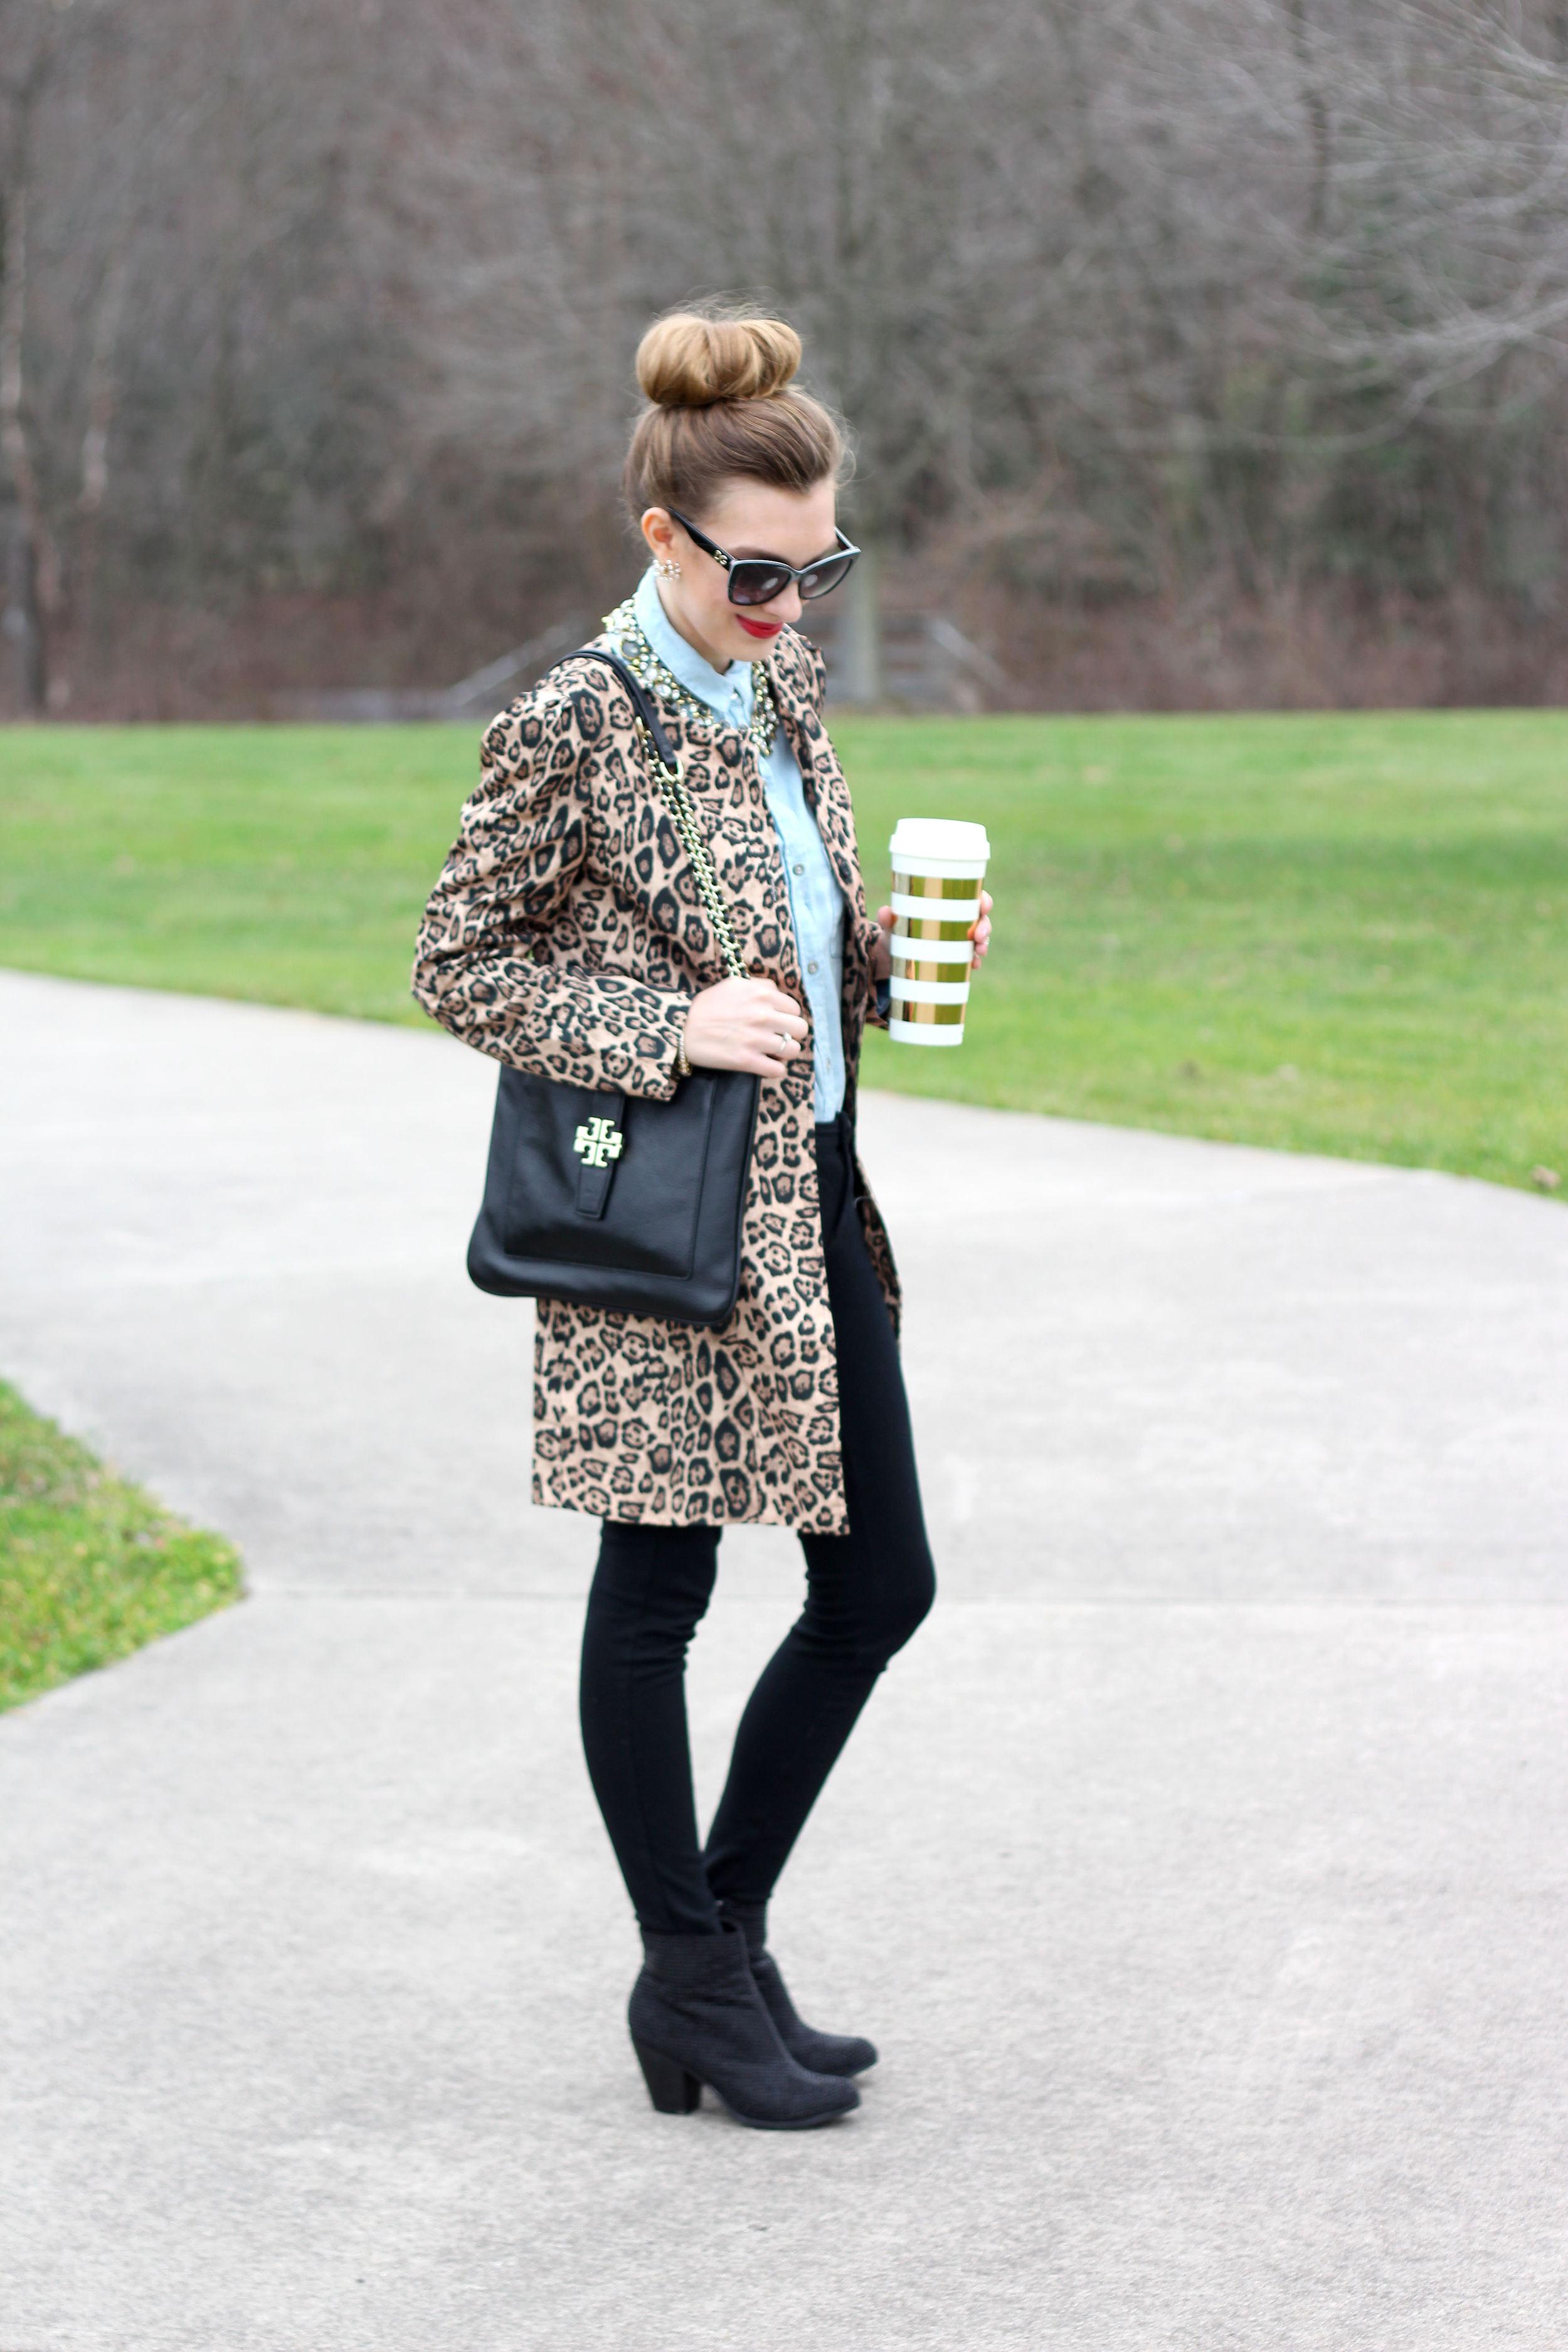 Leopard Coat & Statement Necklace- Enchanting Elegance